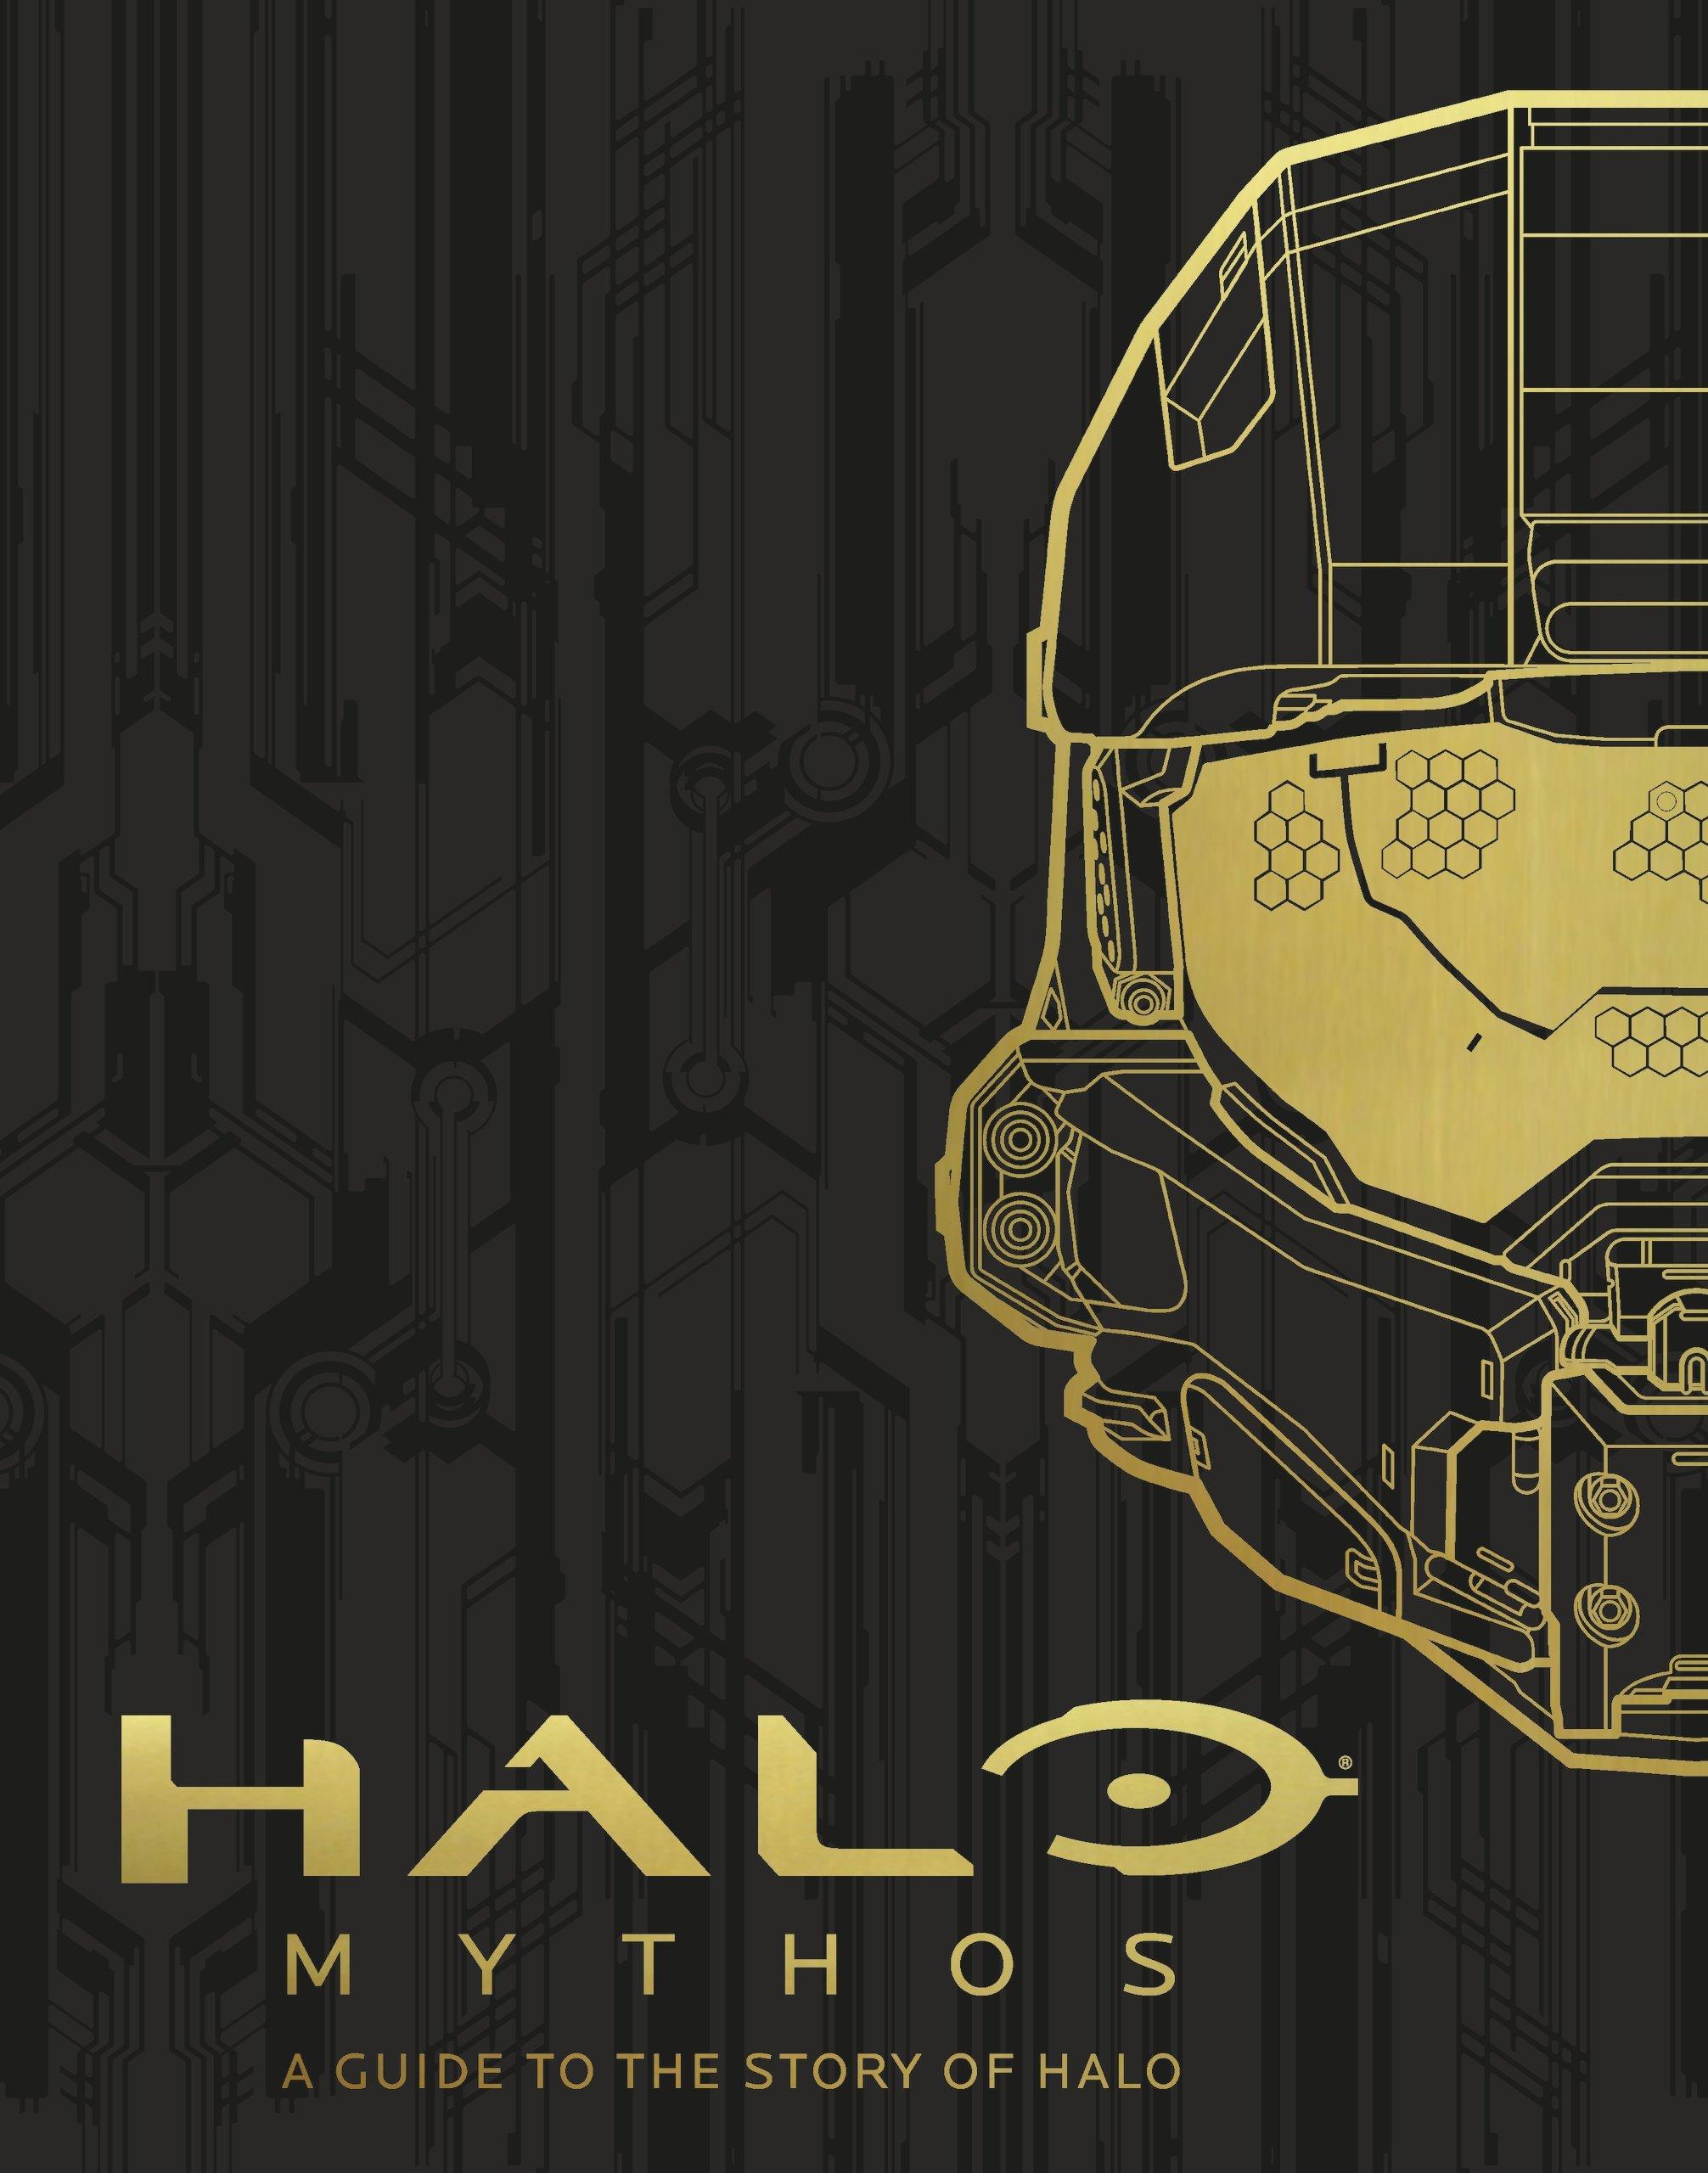 Halo Mythos - A Guide to the Story of Halo (Inglese) Copertina rigida – 1 ott 2016 Microsoft Egmont UK Limited 1405281944 COMPUTERS / Computer Graphics